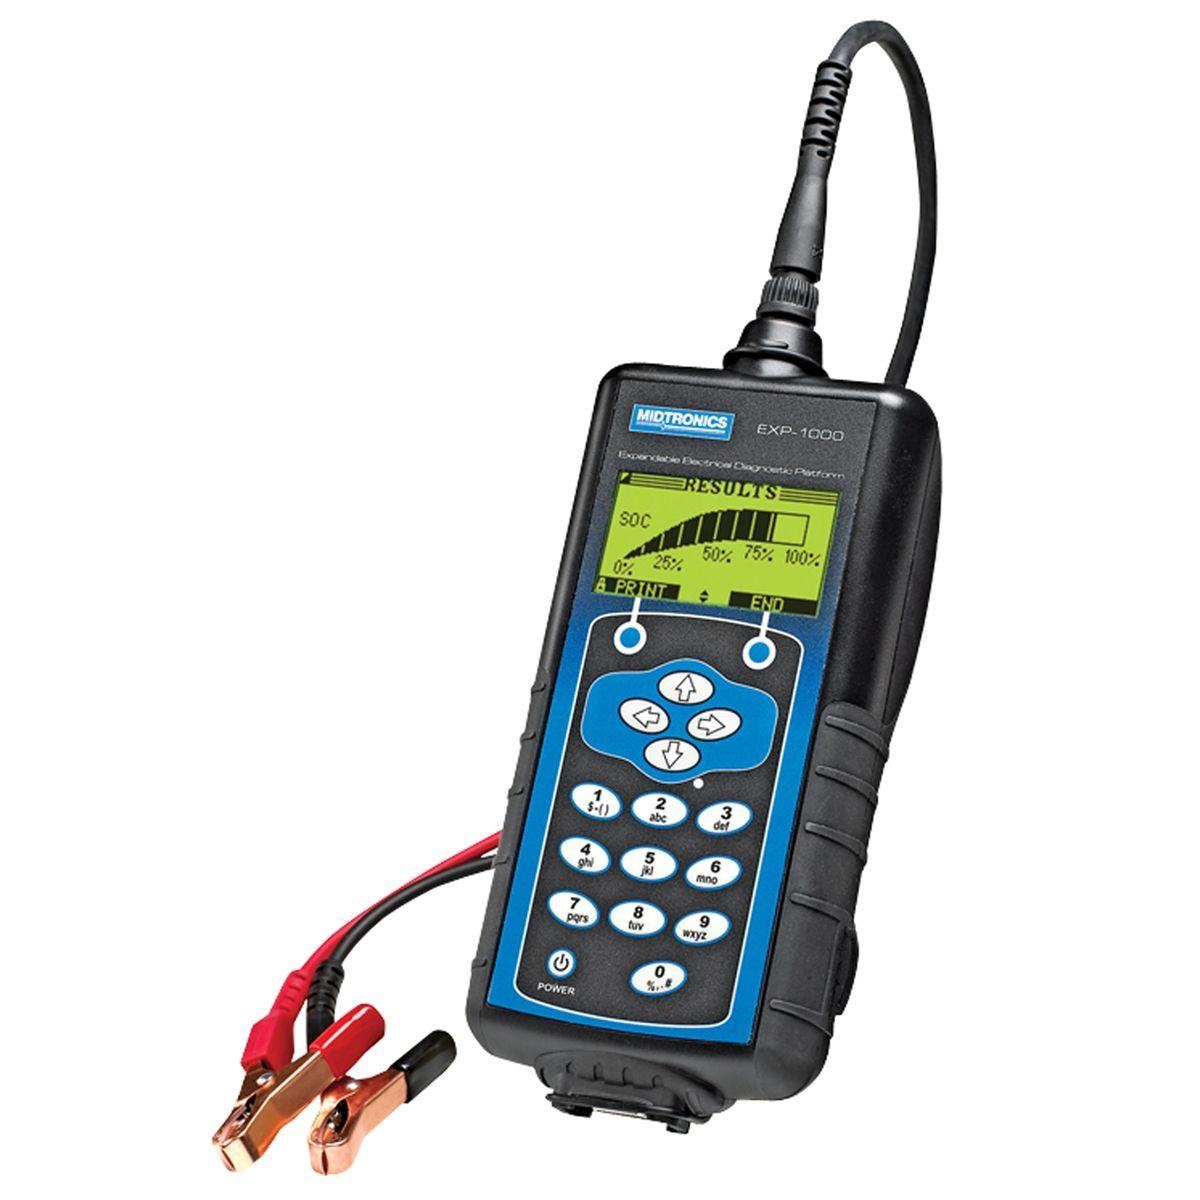 Digital Battery// Charging System Tester MDT-PBT100 Brand New!